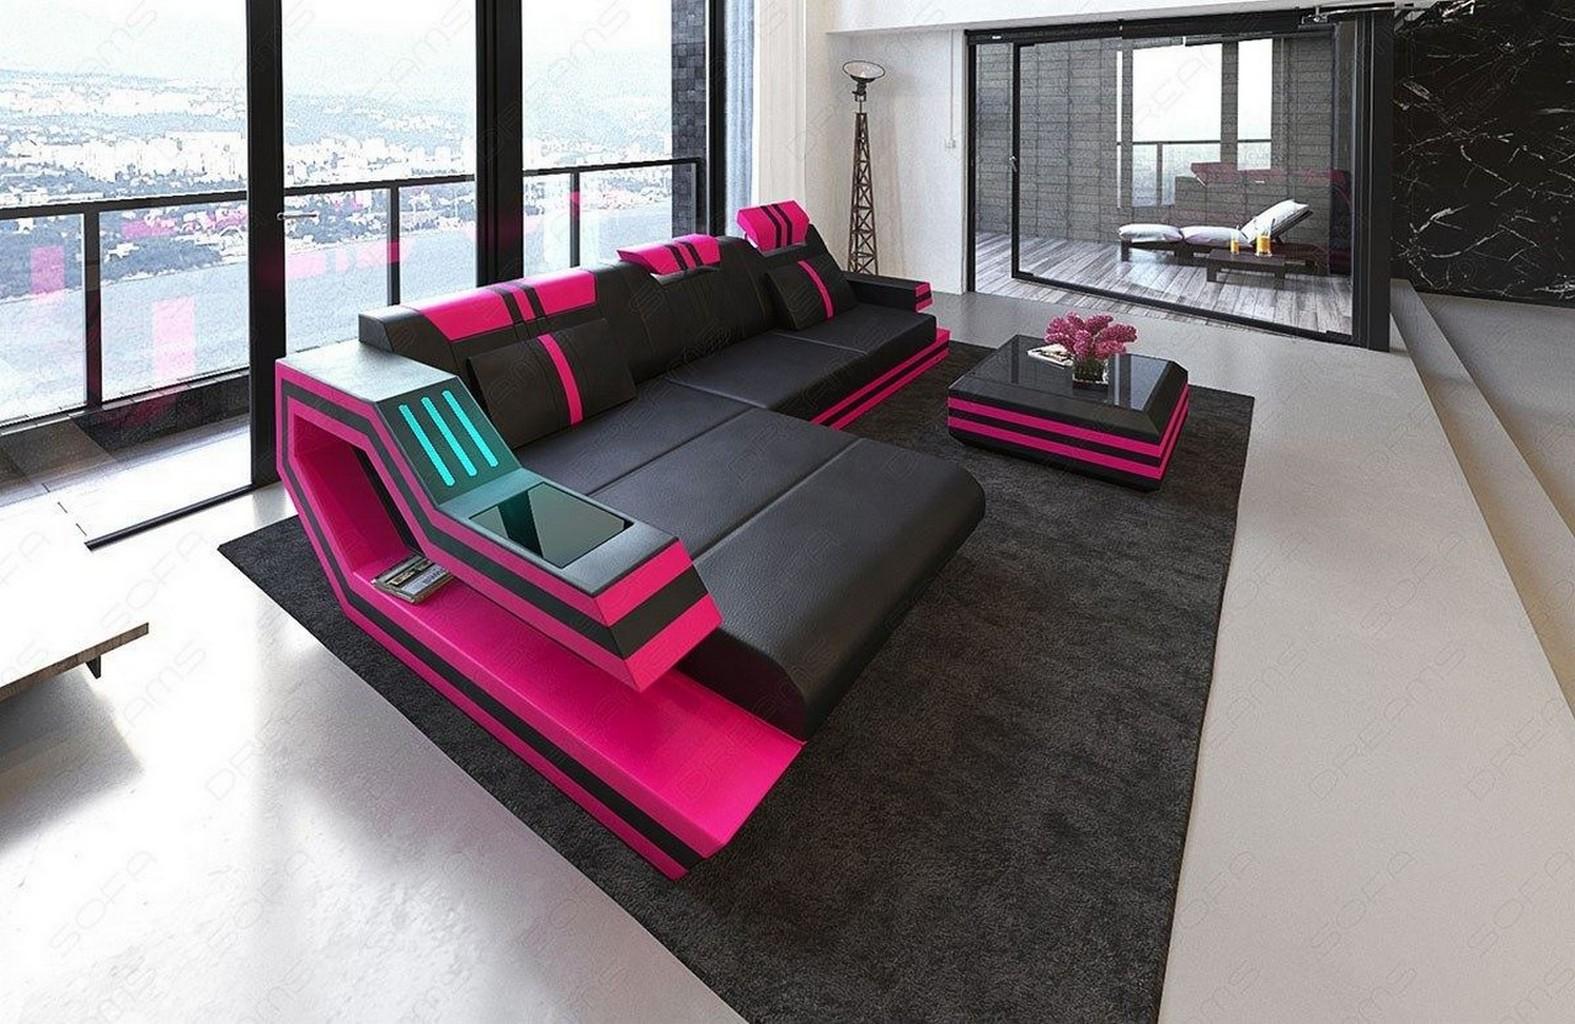 Sectional Sofa Ravenna L Shape Genuine Leather Design Corner Sofa Led  Lights Ebay